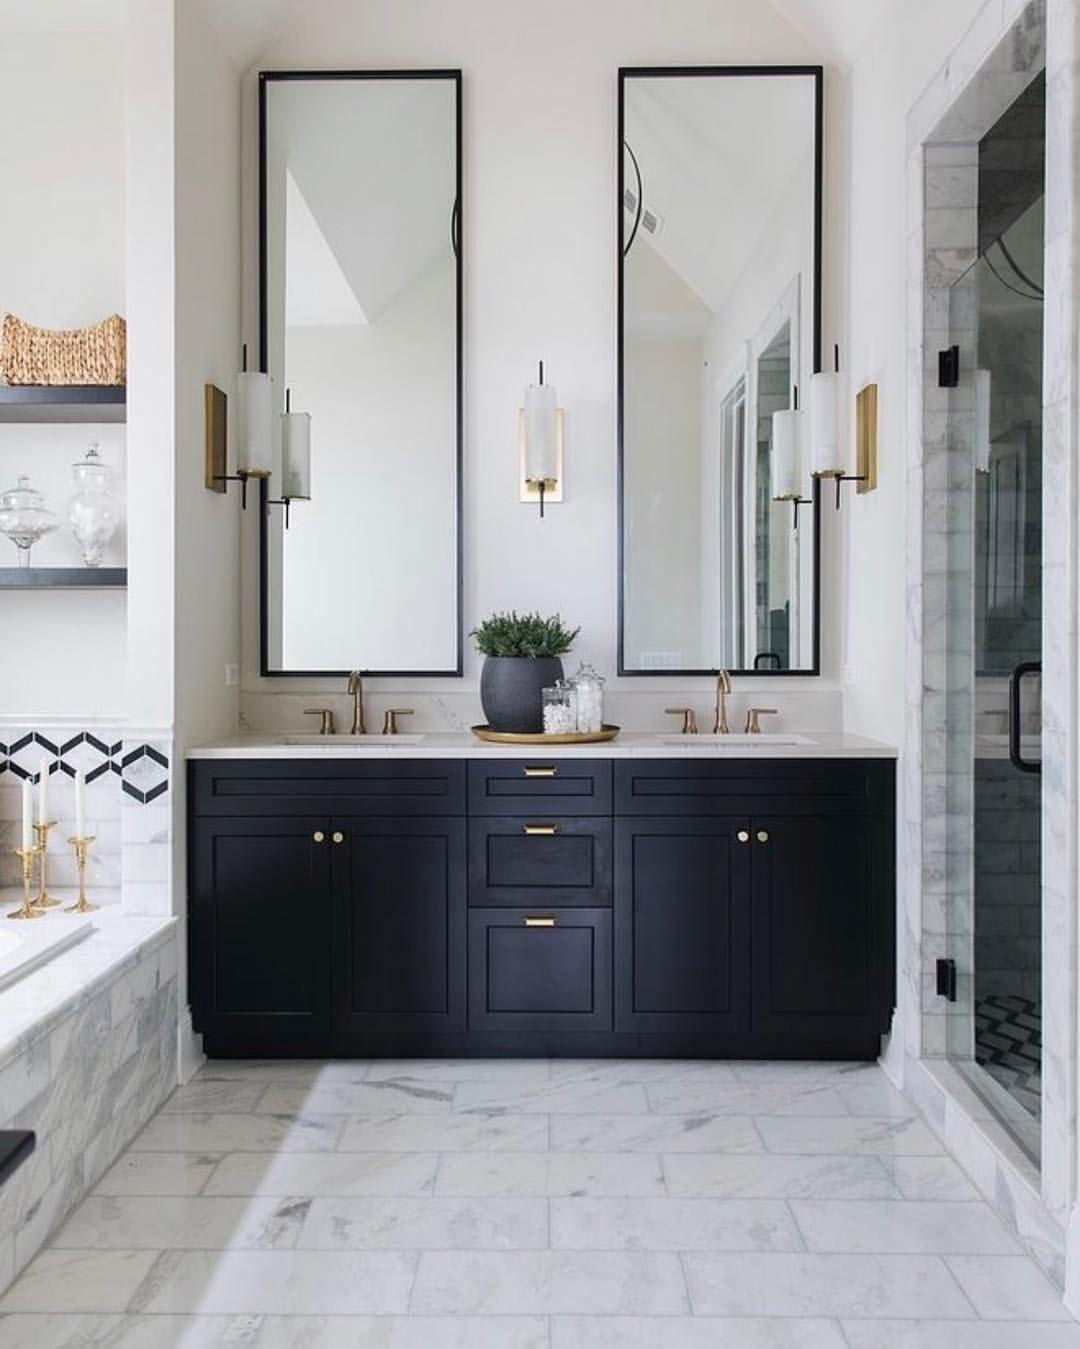 This Color Scheme Image Found On Pinterest Bath Bathroomdesign Painted Vanity Bathroom Bathroom Interior Design Bathroom Inspiration